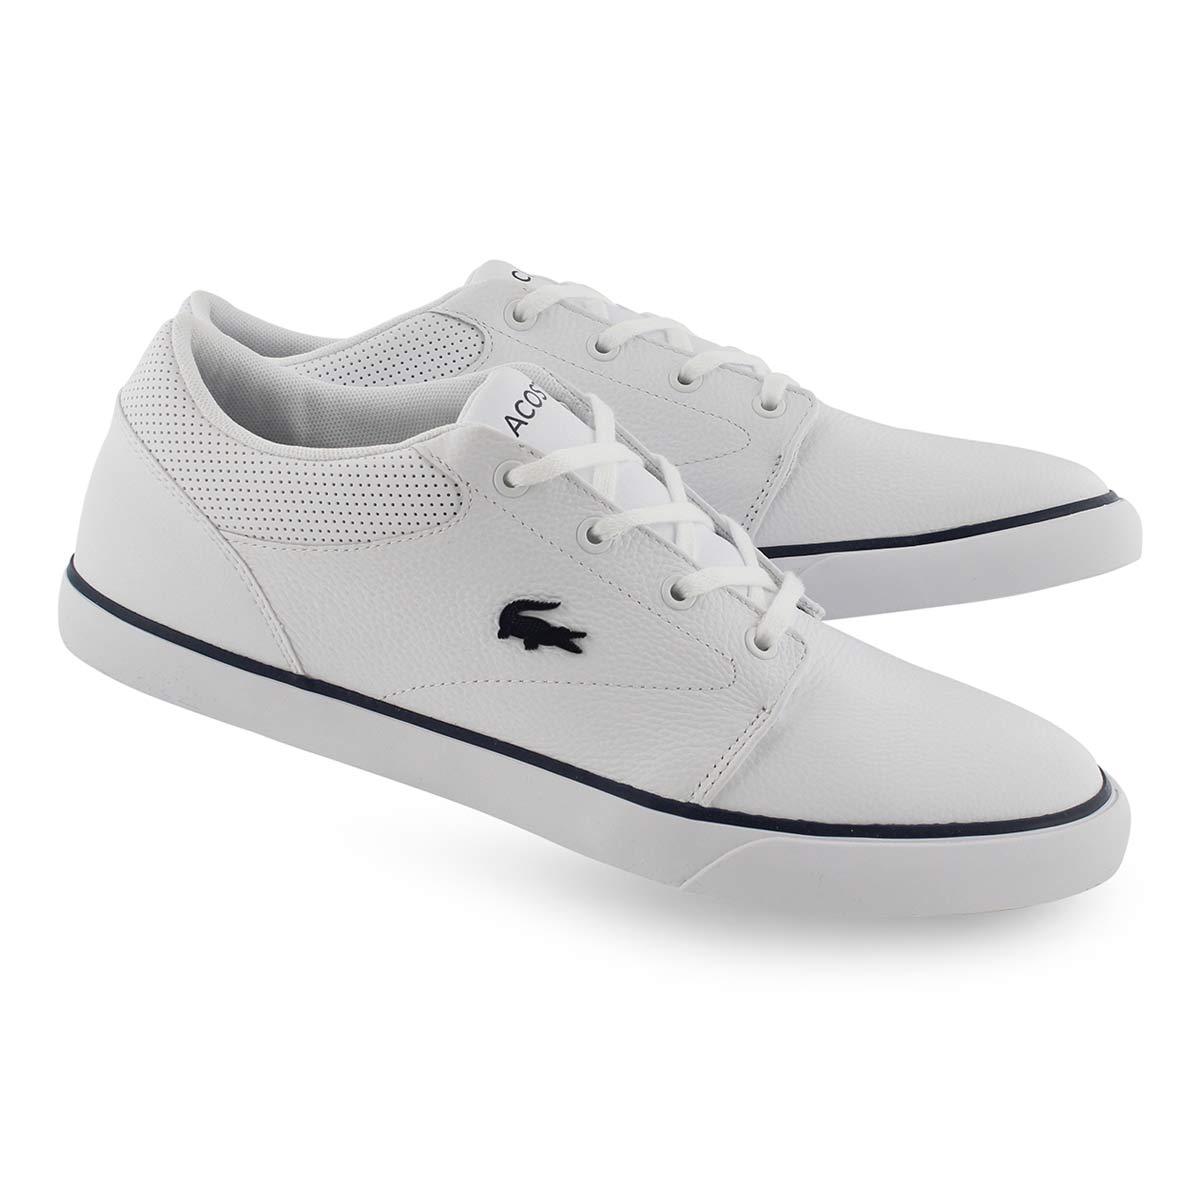 Mns Minzah 119 wht/nvy lace up sneaker